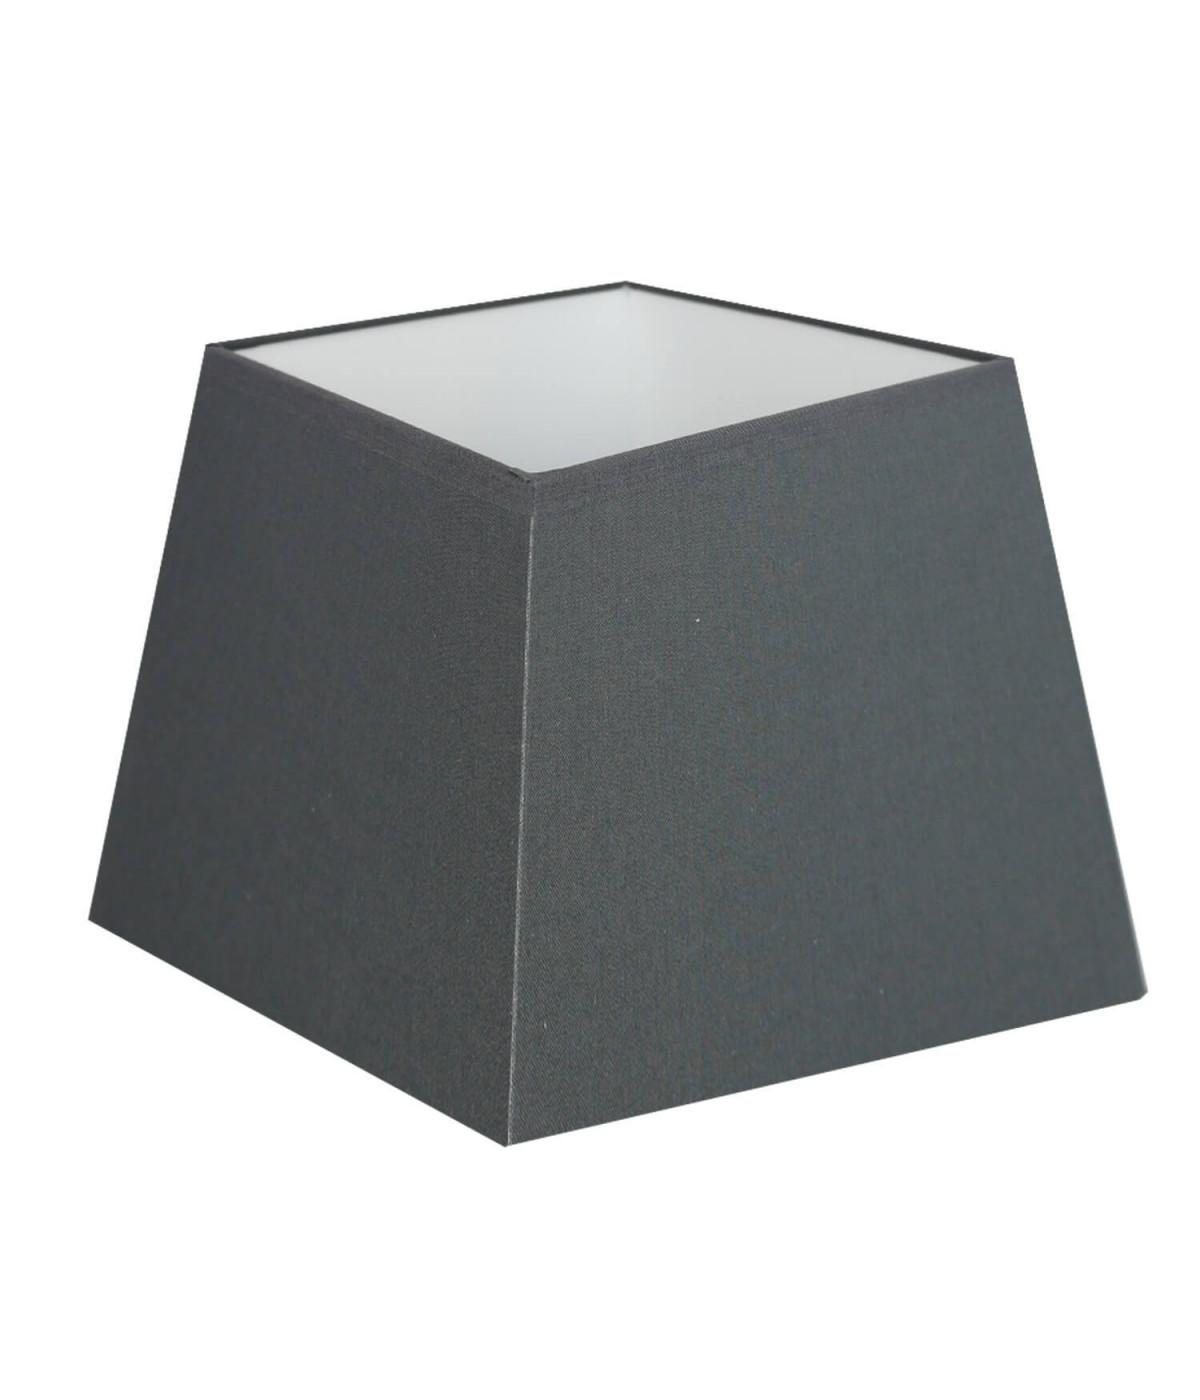 Abat-jour carre pyramidal Gris souris